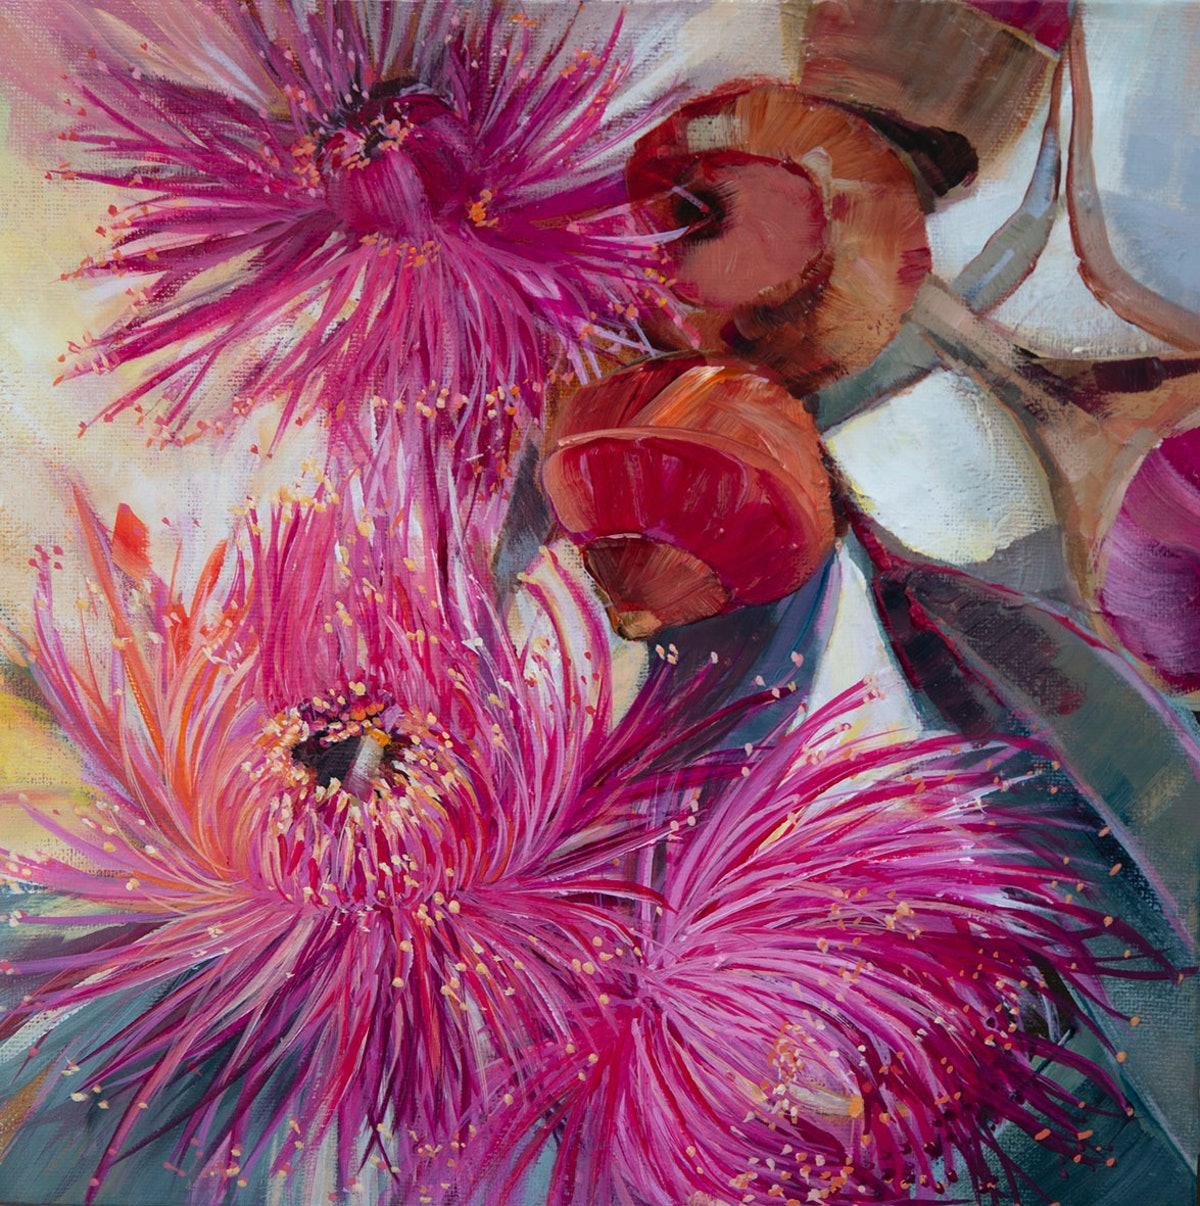 Gosia Orzechowska Vivid Pink Bluethumb 2ccf